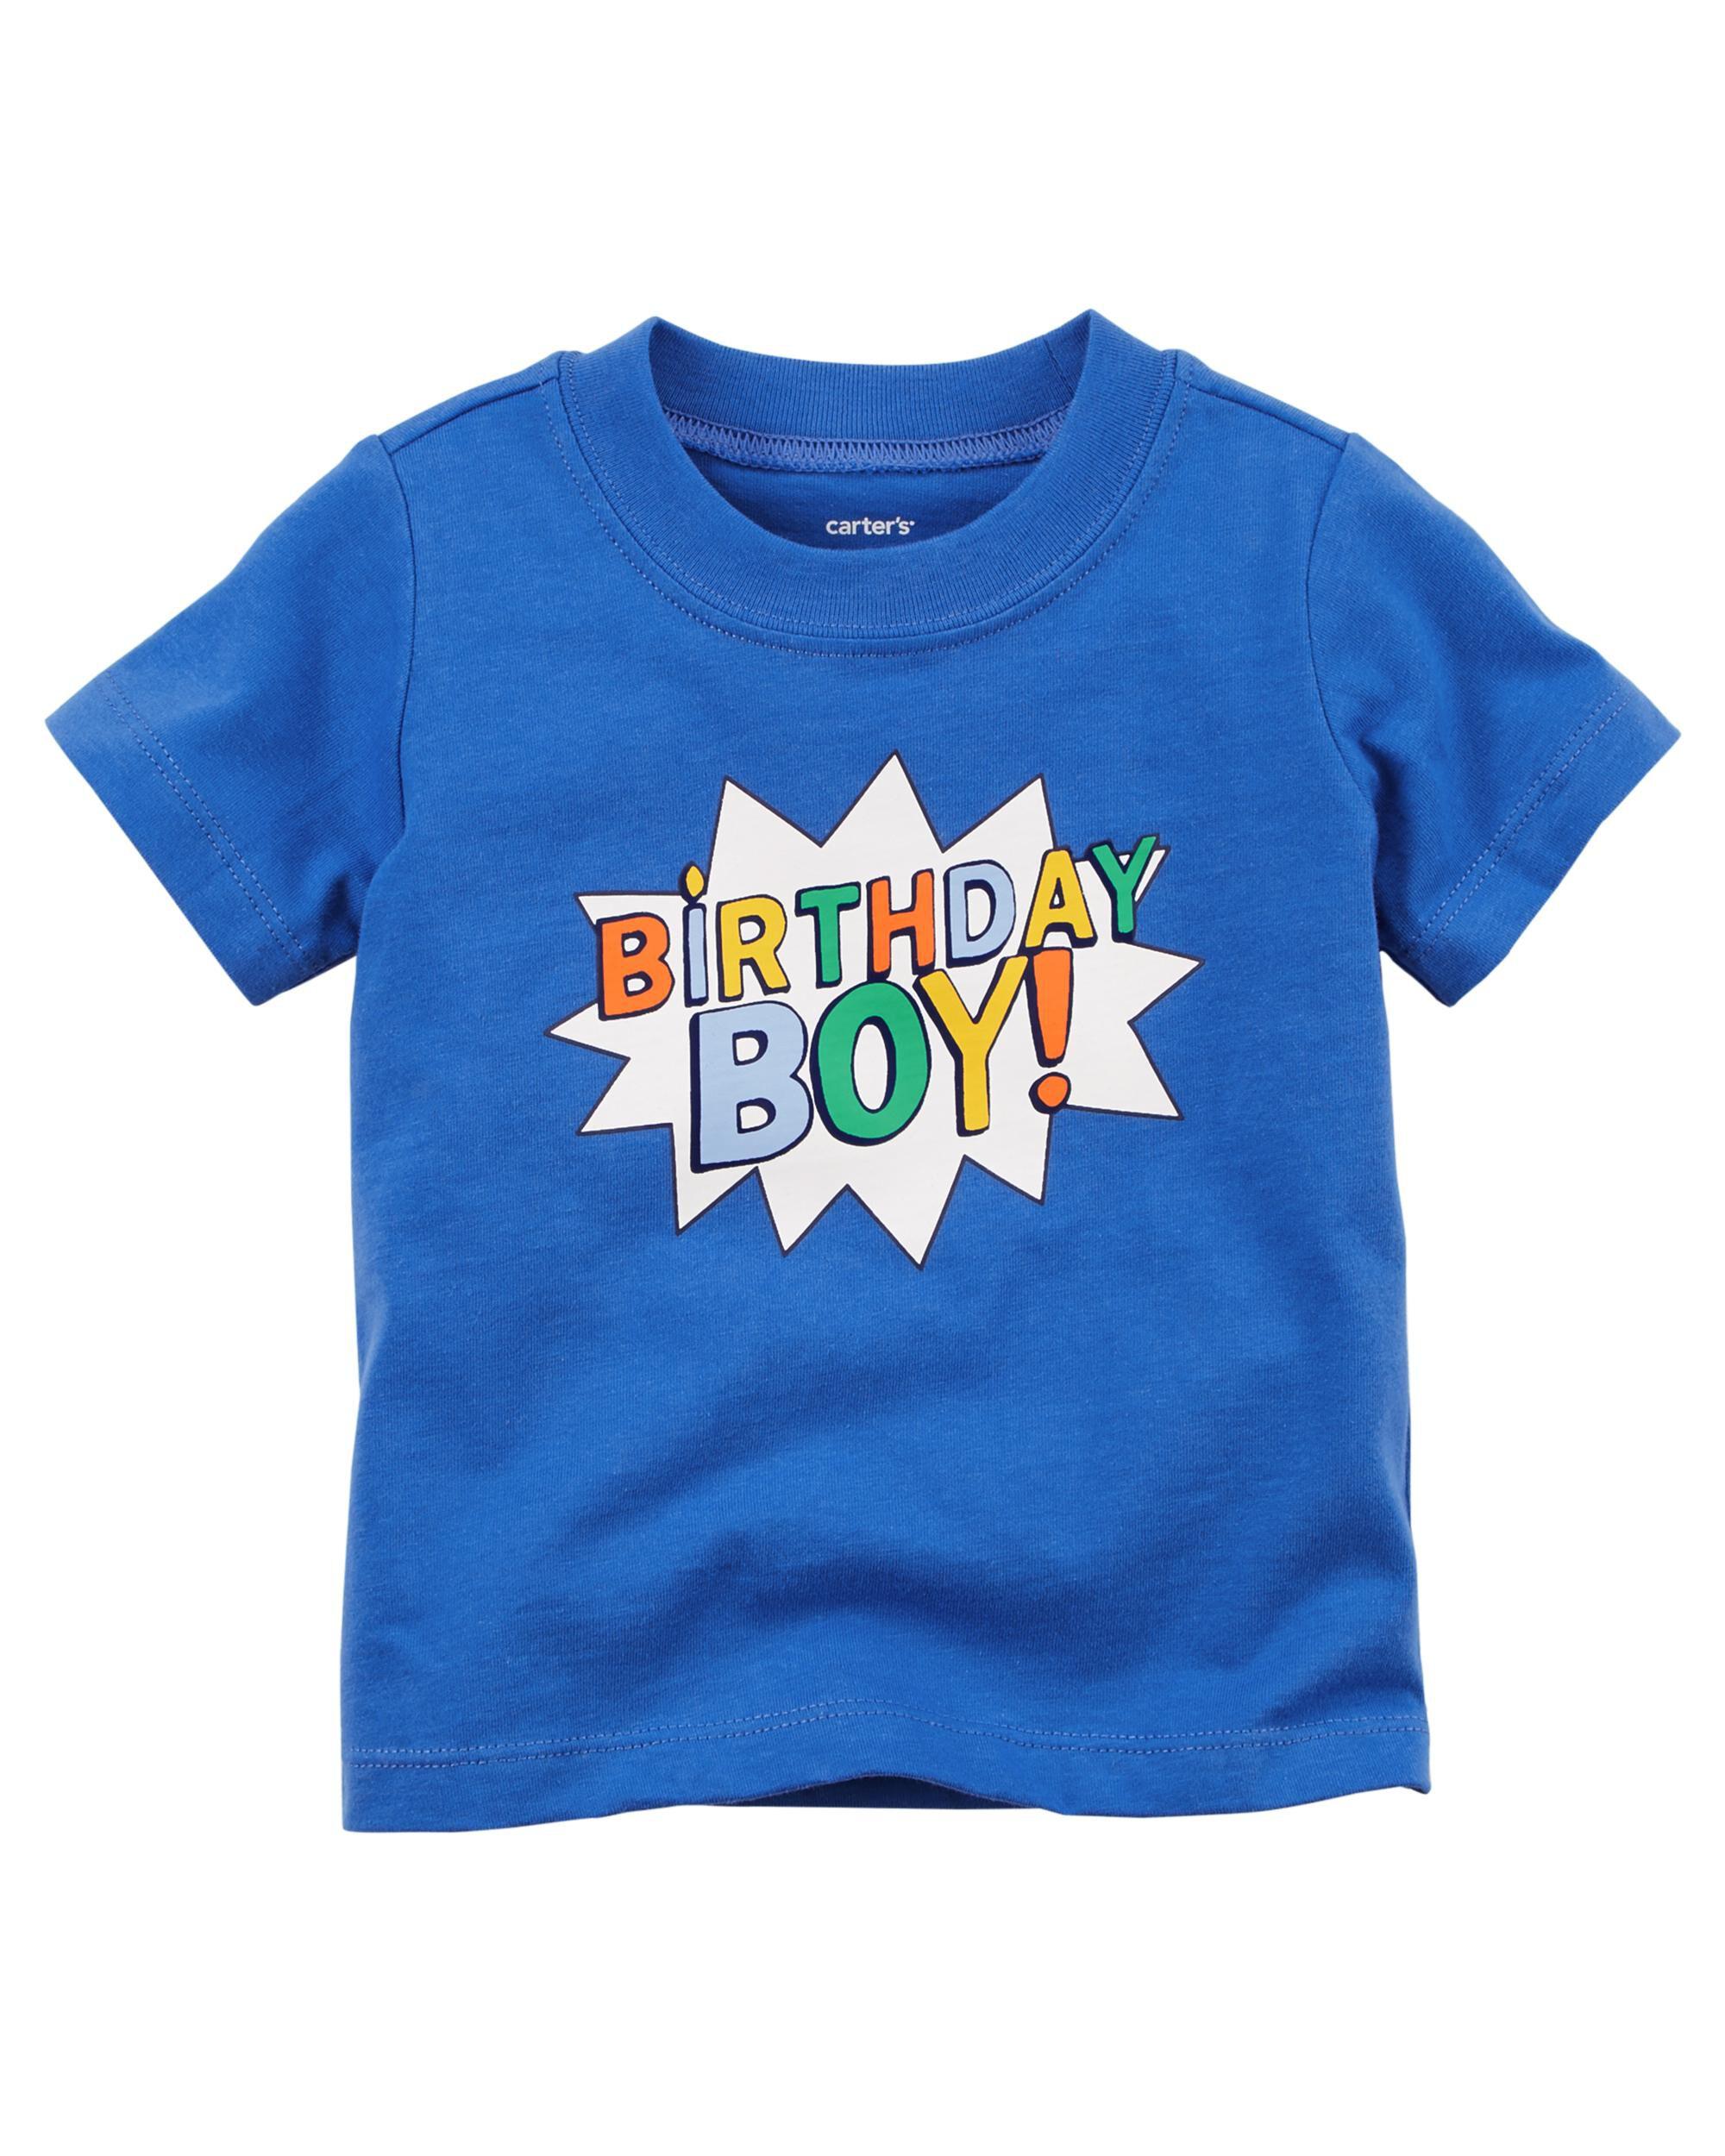 Birthday Boy Tee Carters Com